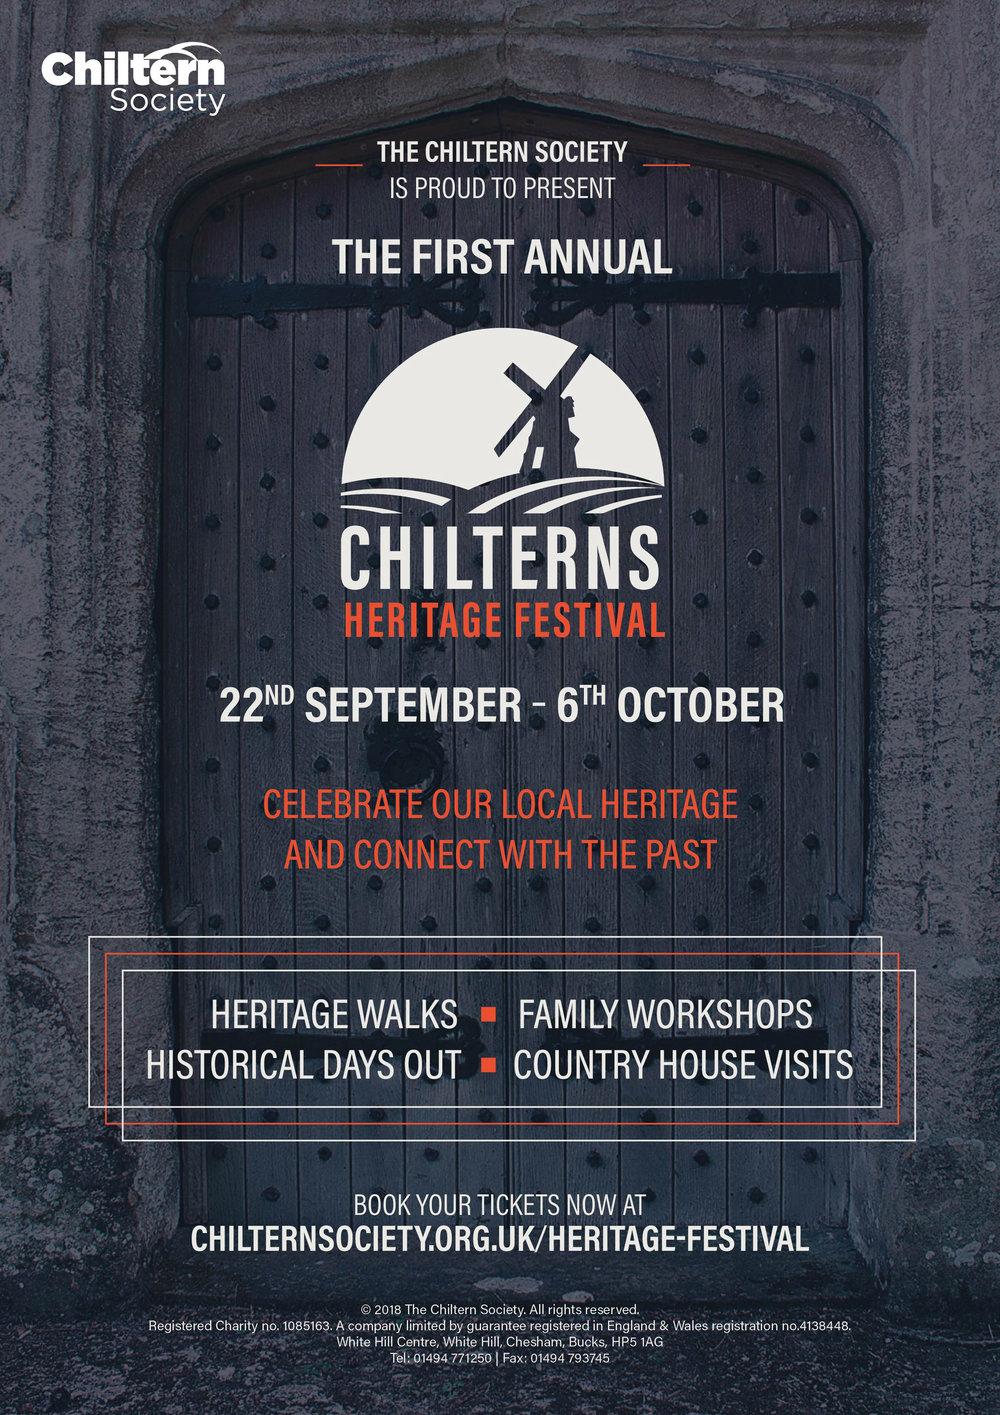 7327_Chiltern Society_Chiltern Heritage PosterA4.jpg